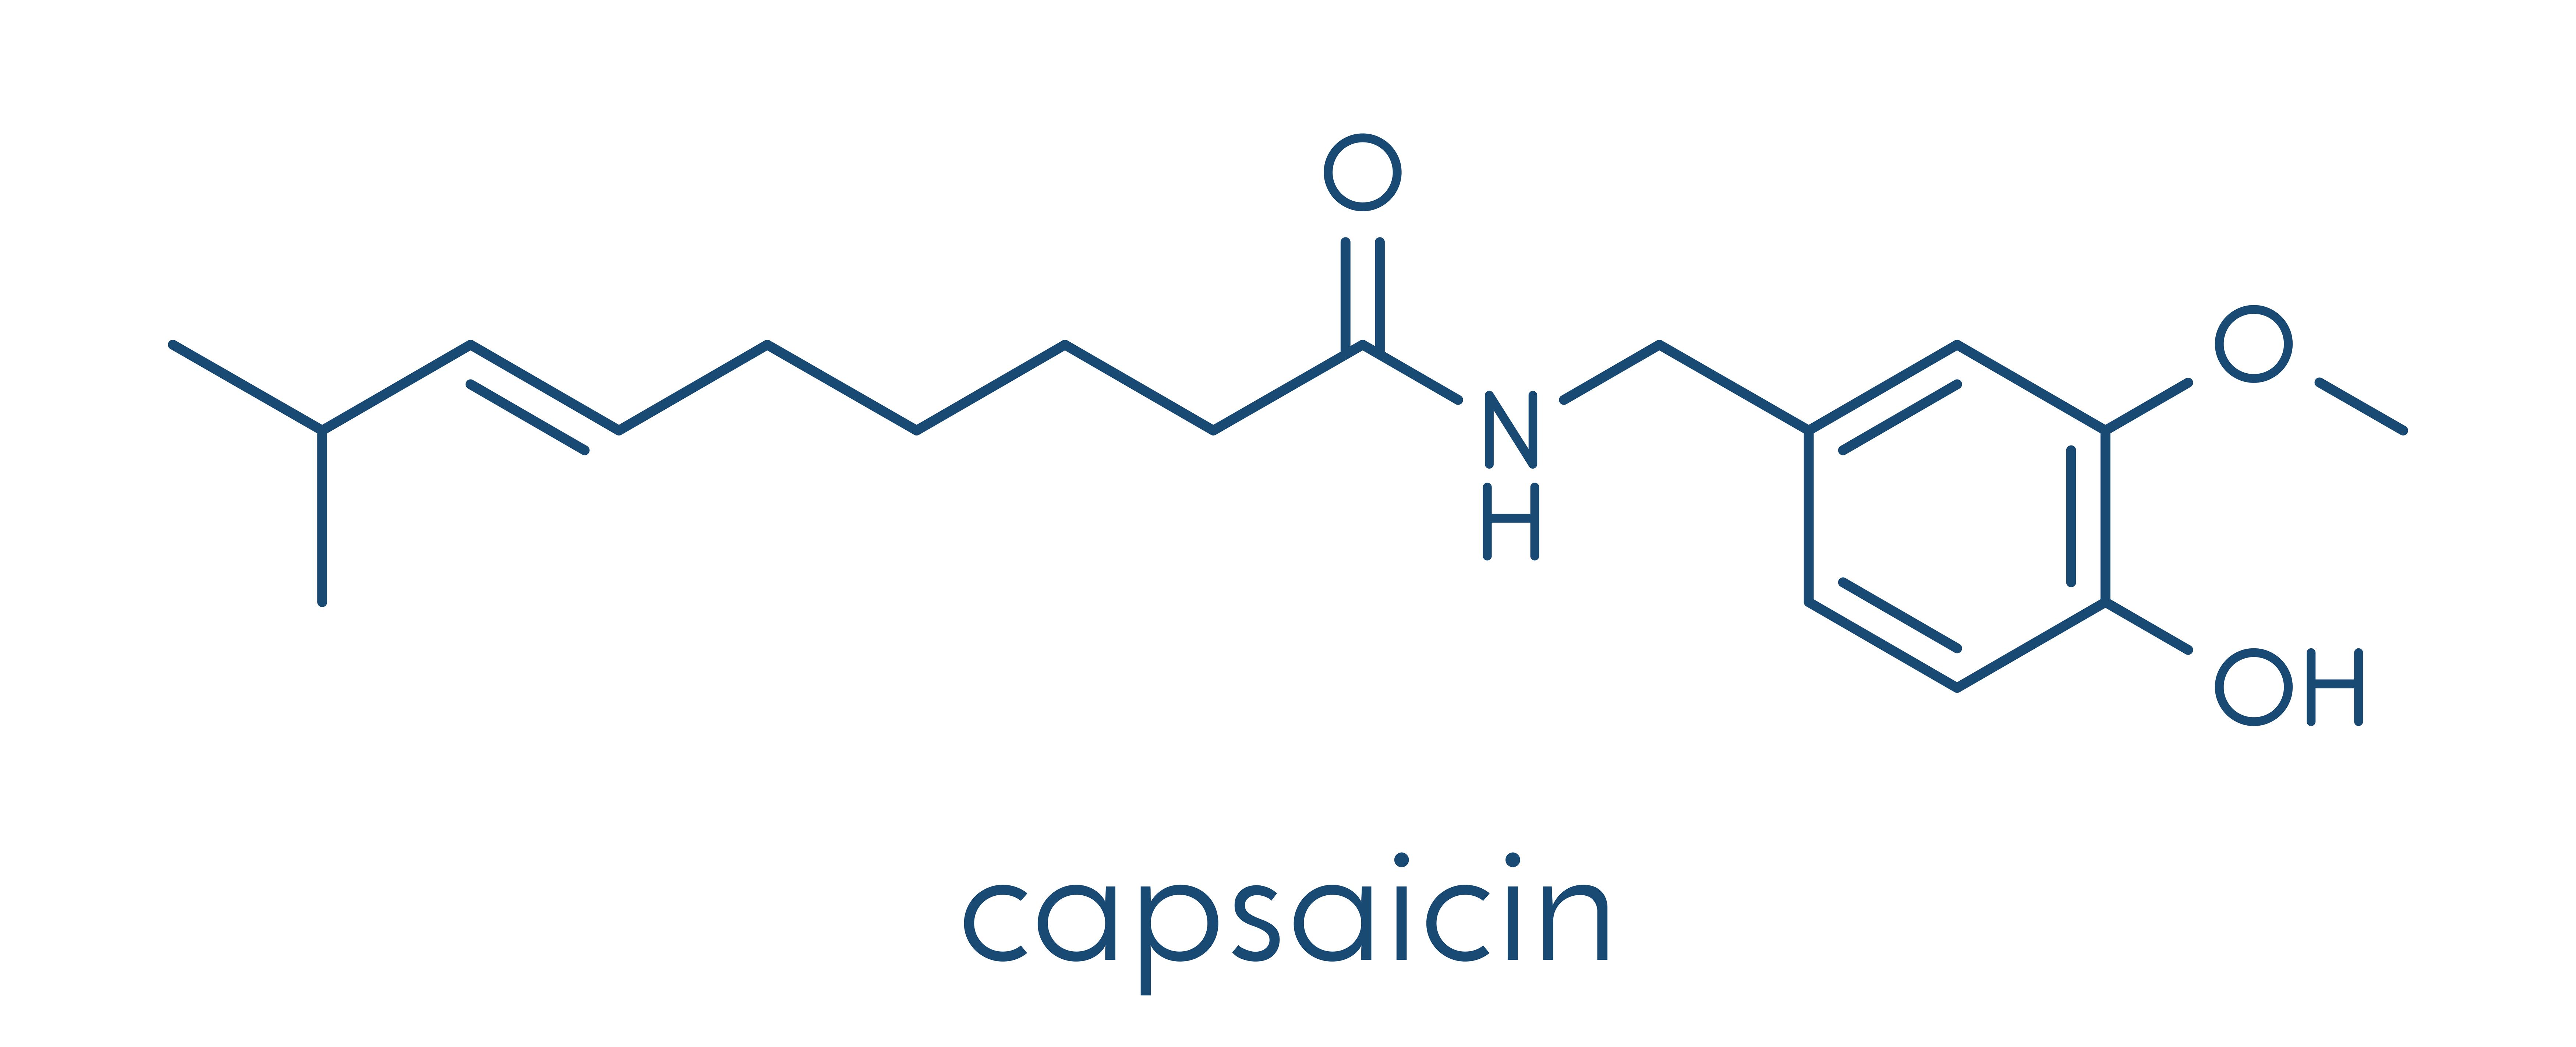 Capsaicin - chemical formula